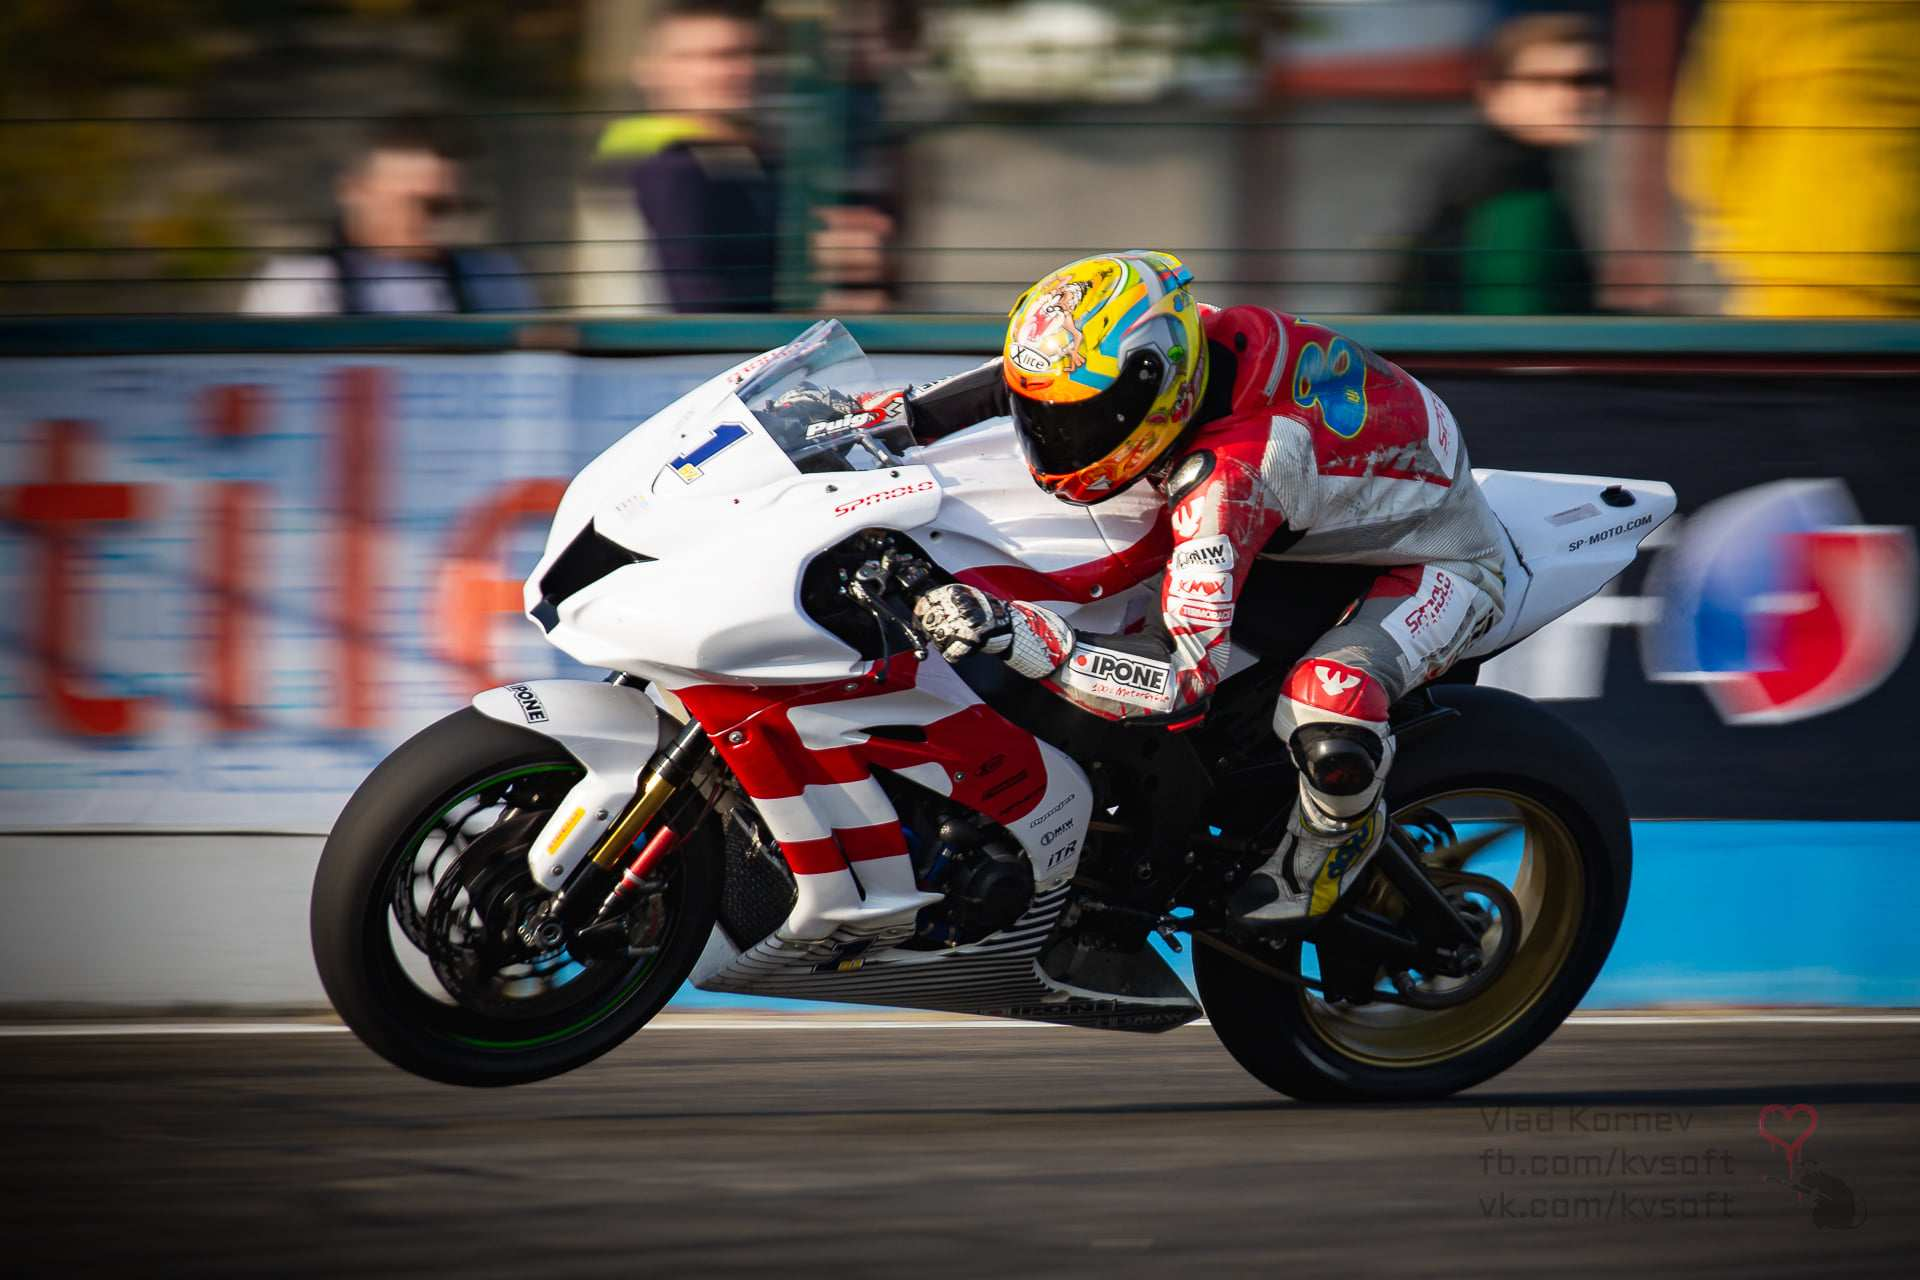 5-6_etap_MotoGPUkraine_137